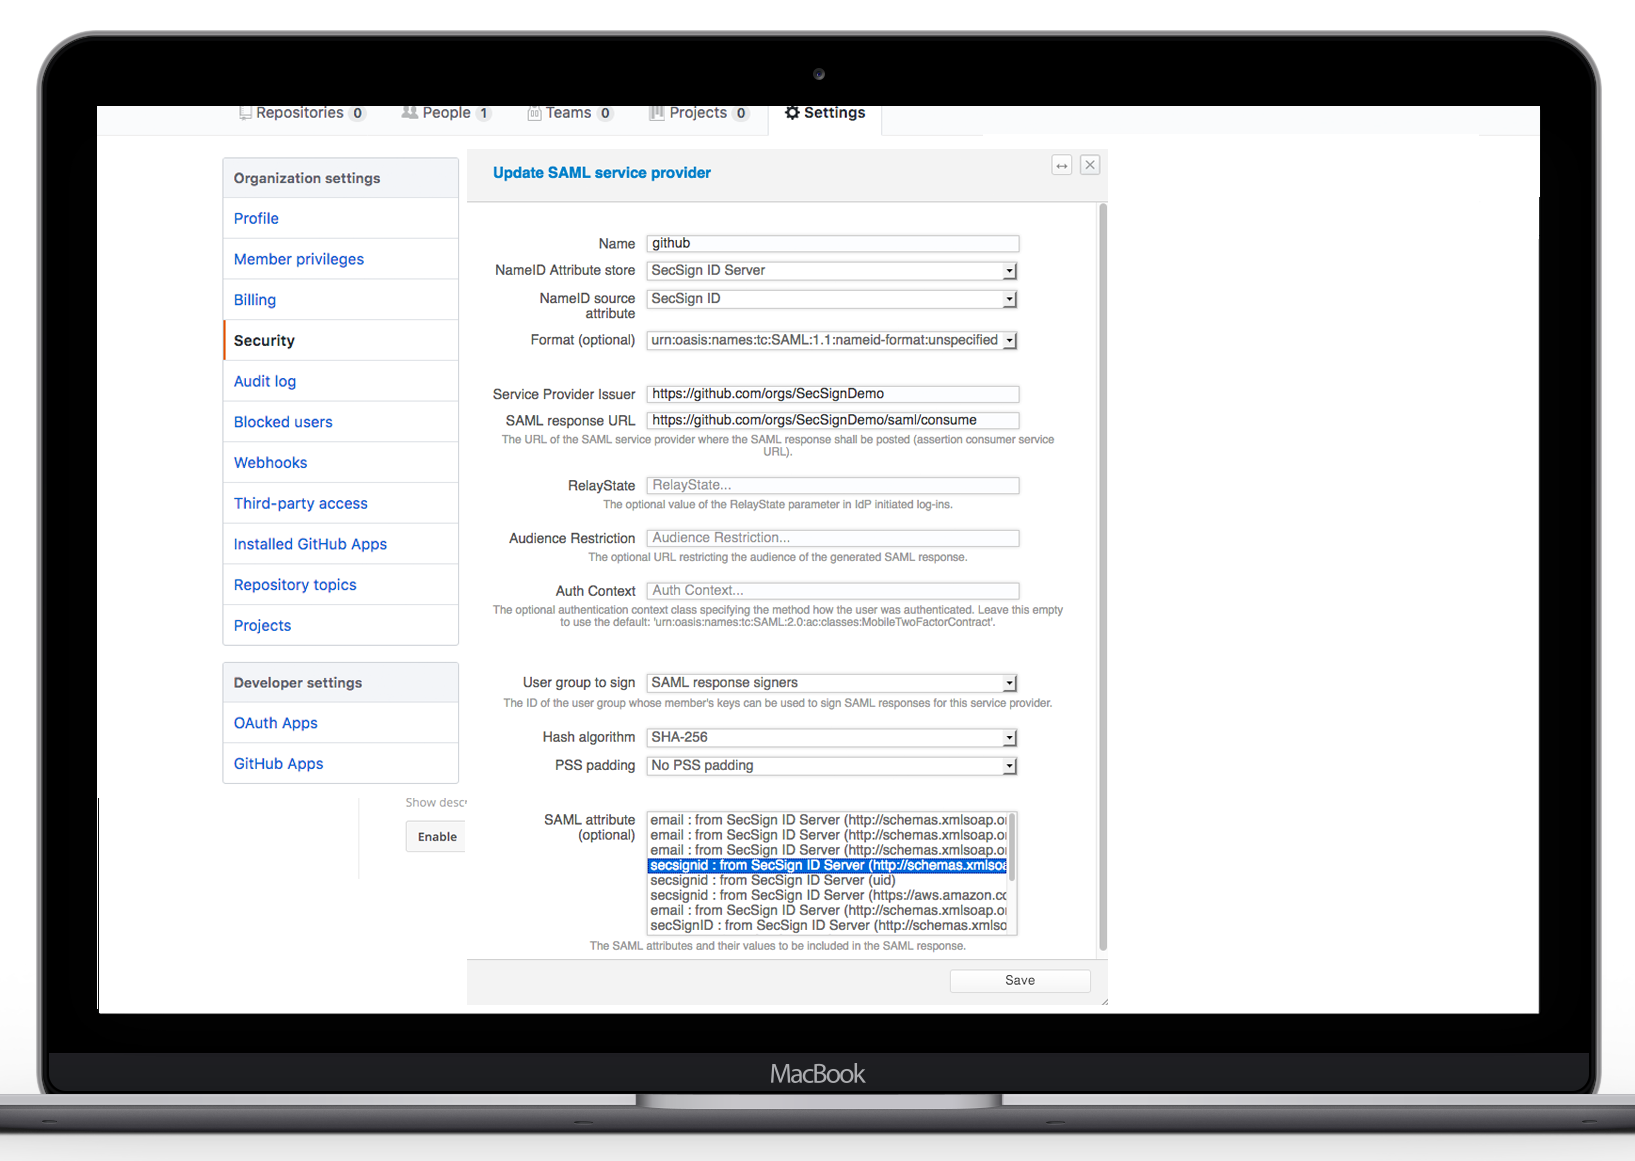 SecSign ID for GitHub with SAML | SecSign 2FA